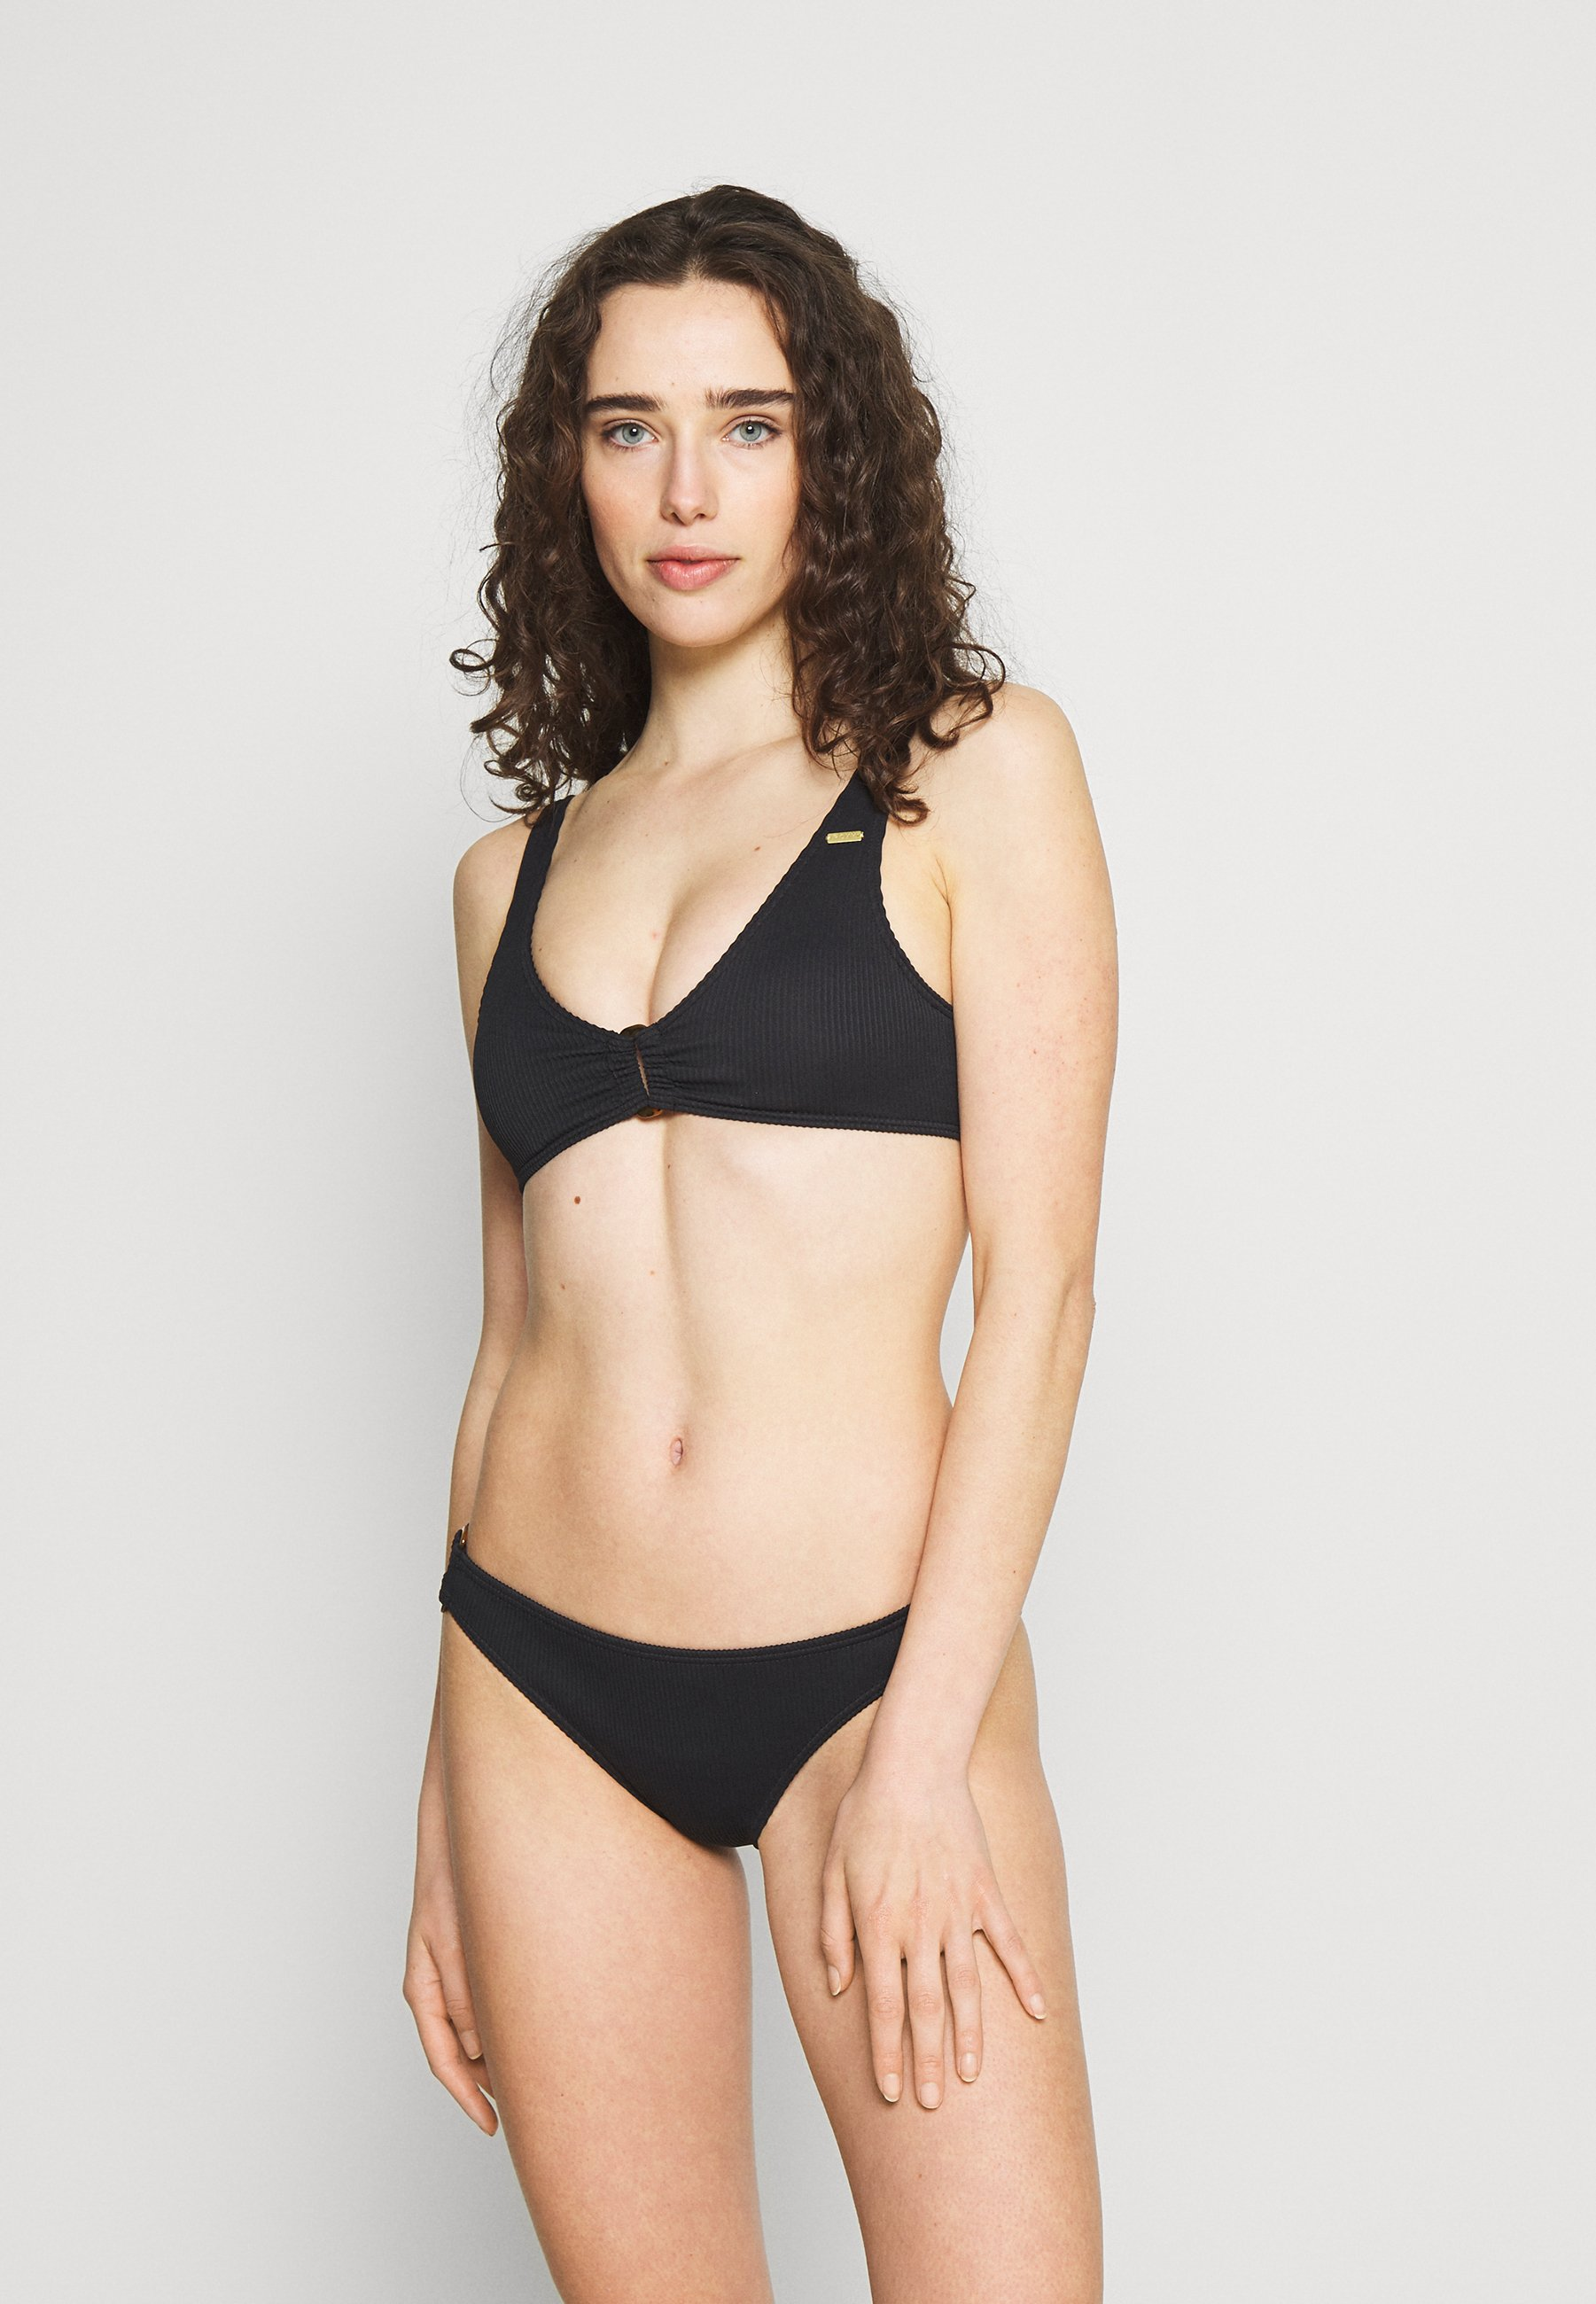 Women MIND OF FREEDOM - Bikini